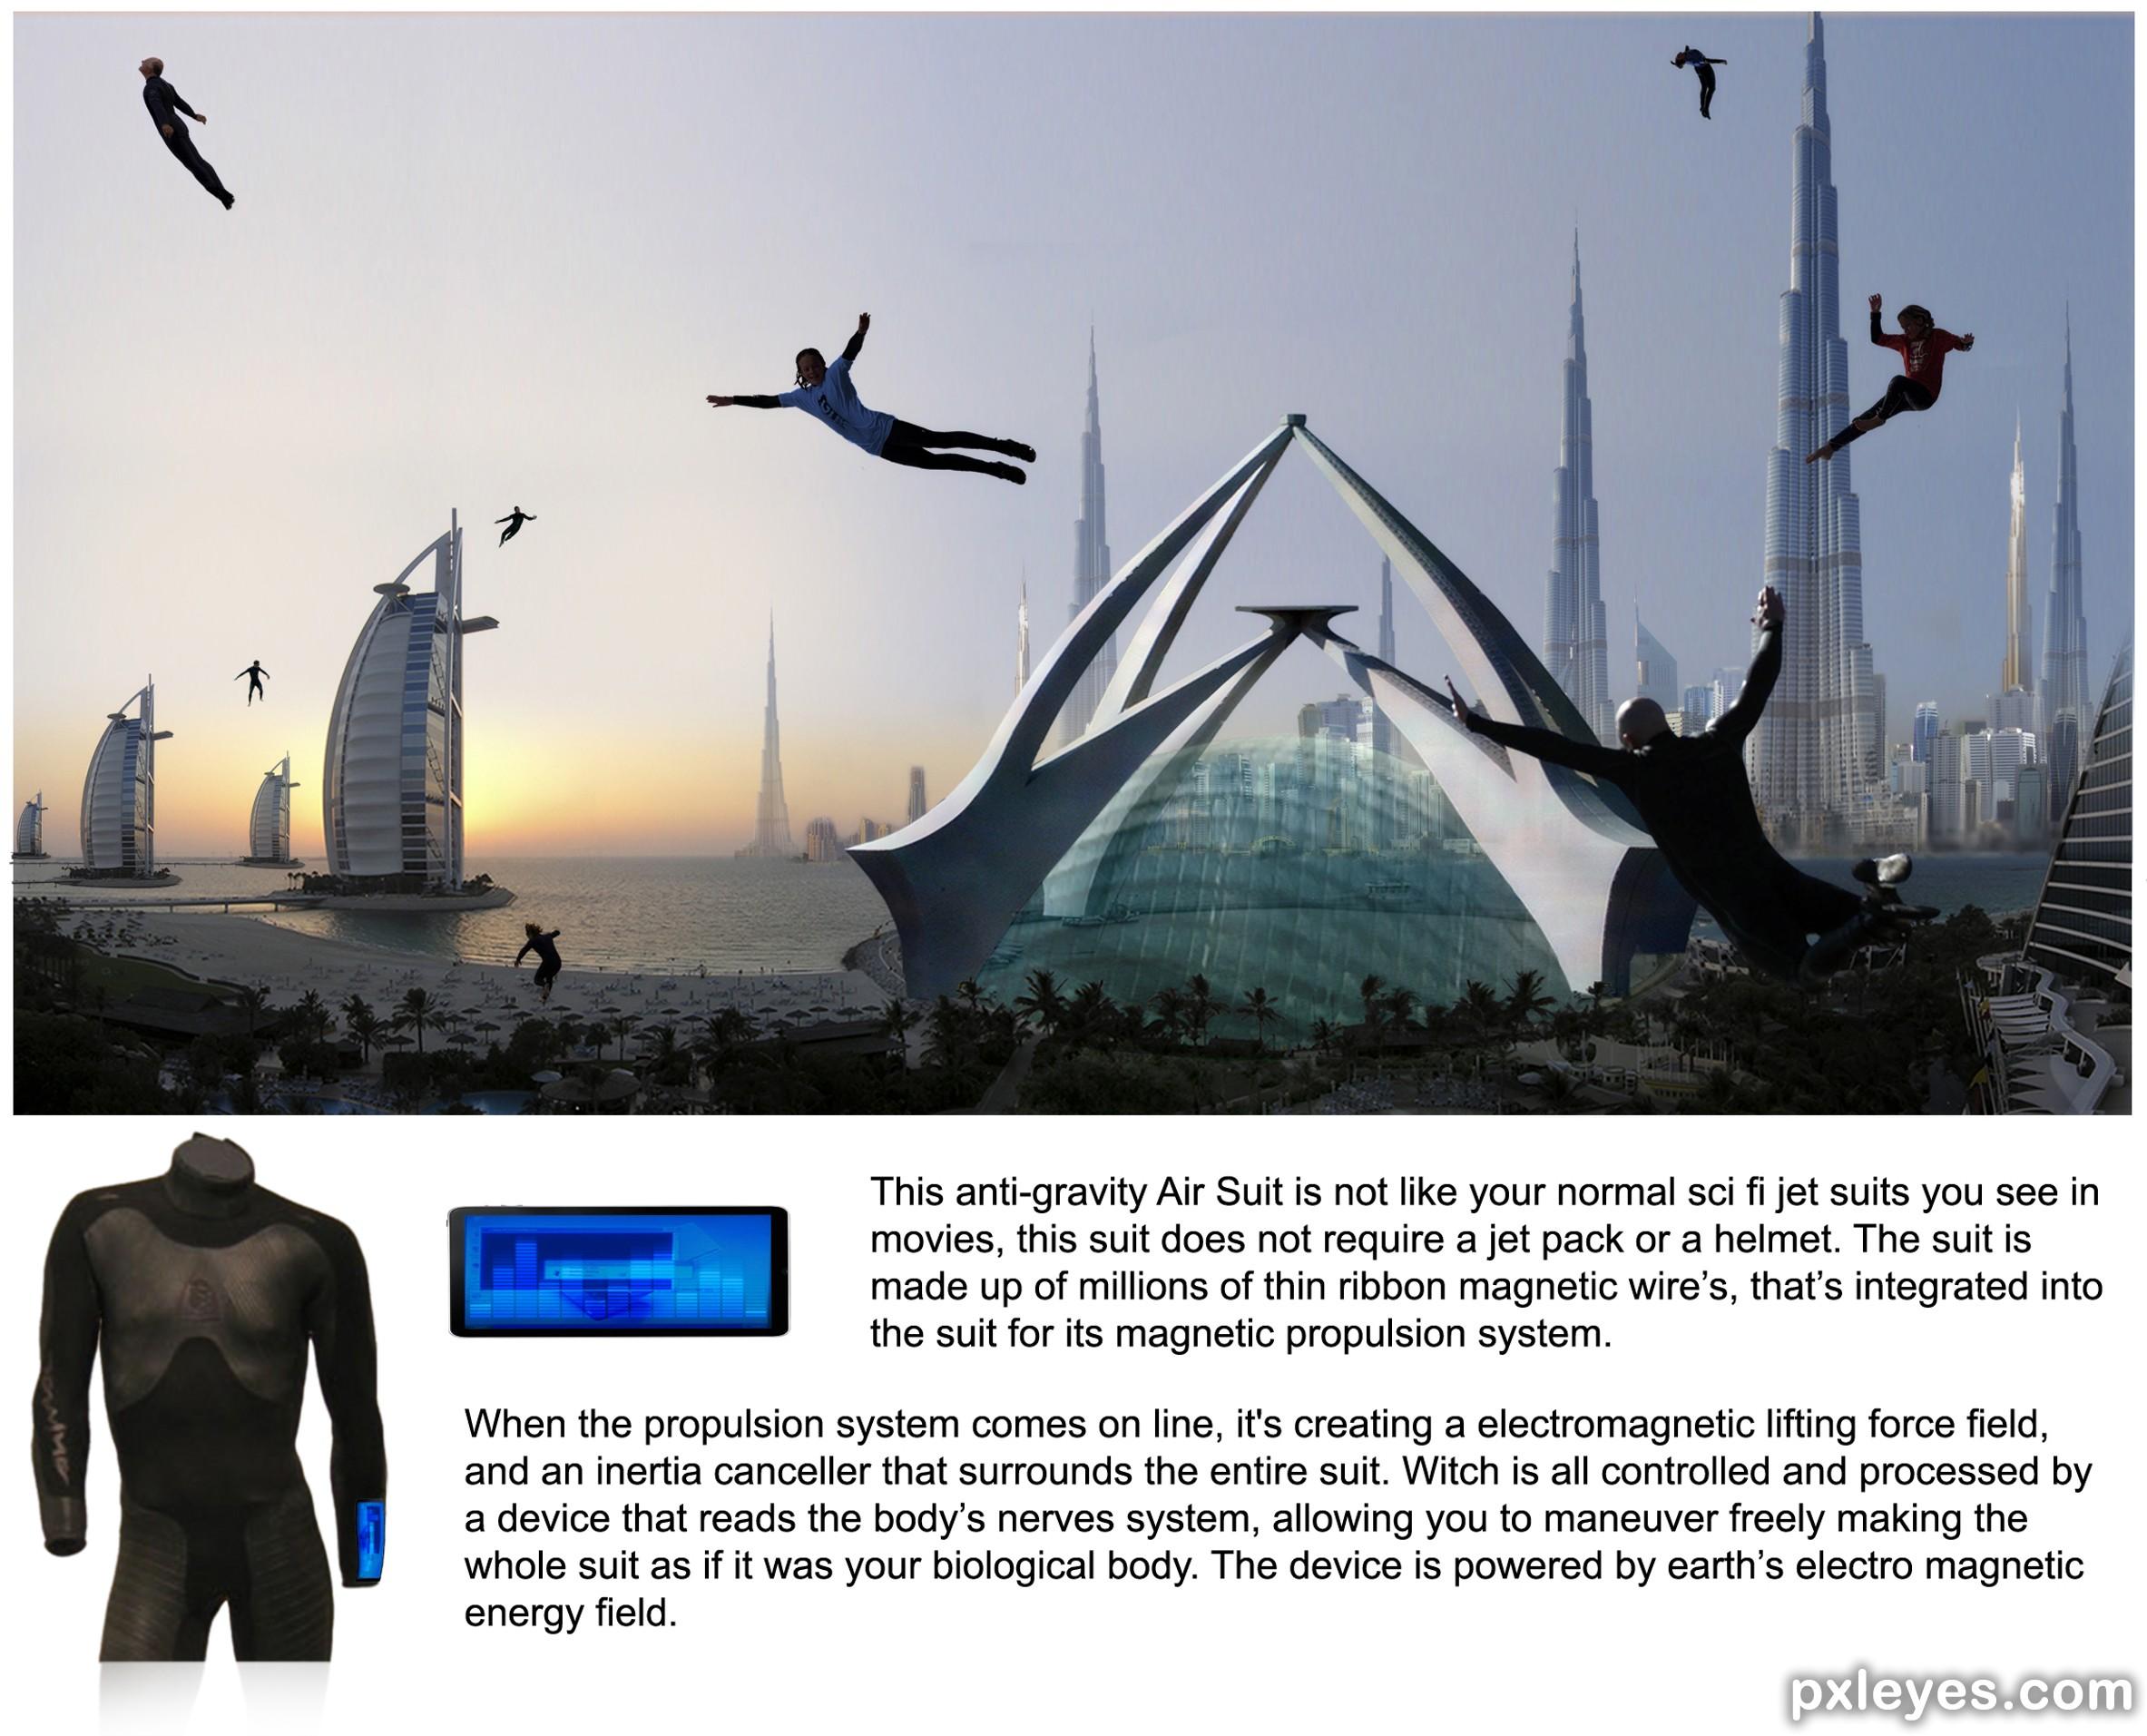 Anti-gravity Suit Photoshop Contest (21357), Pictures Page 1